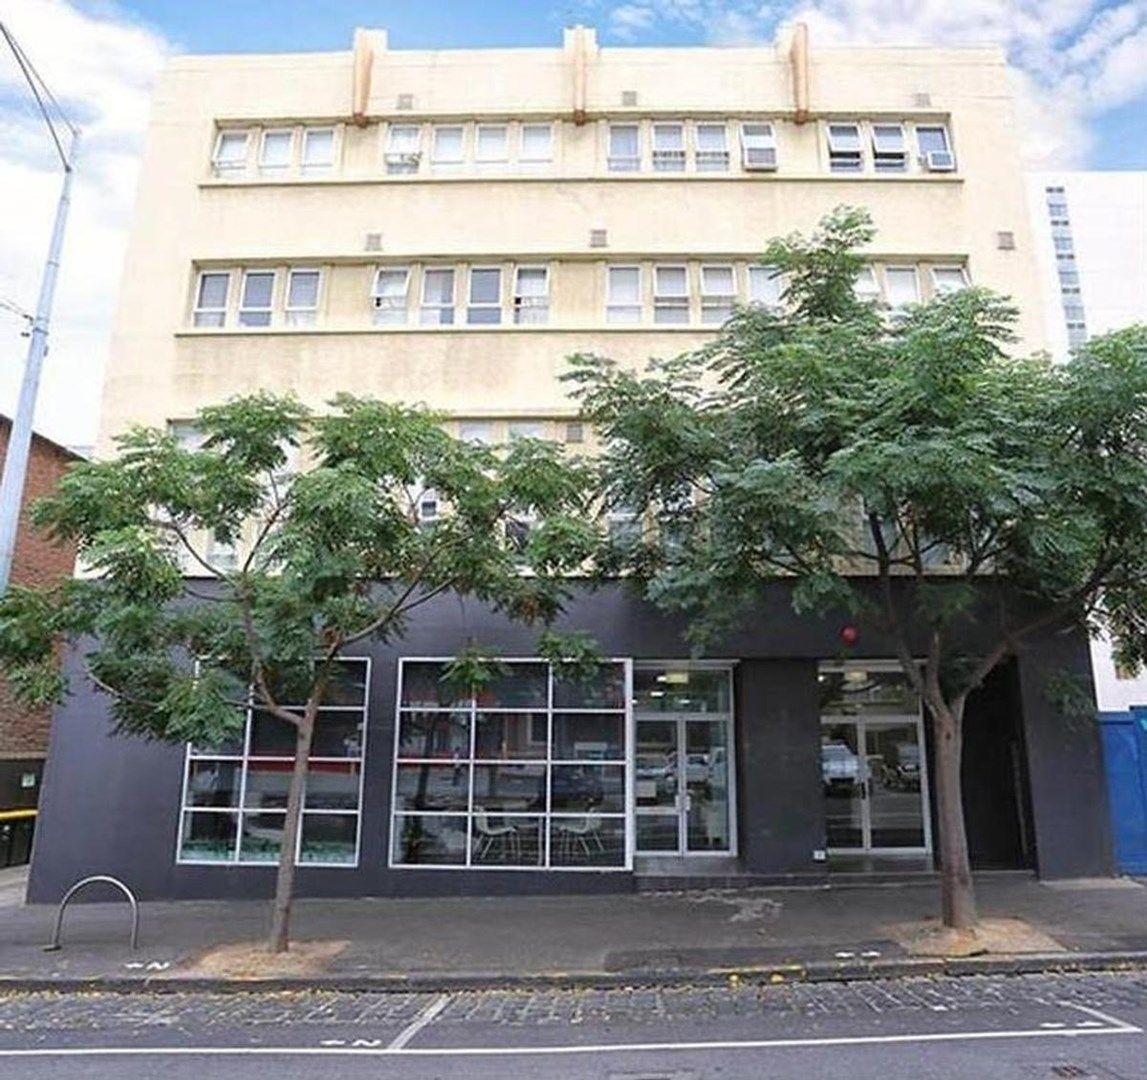 15/117-121 Bouverie Street, Carlton VIC 3053, Image 0